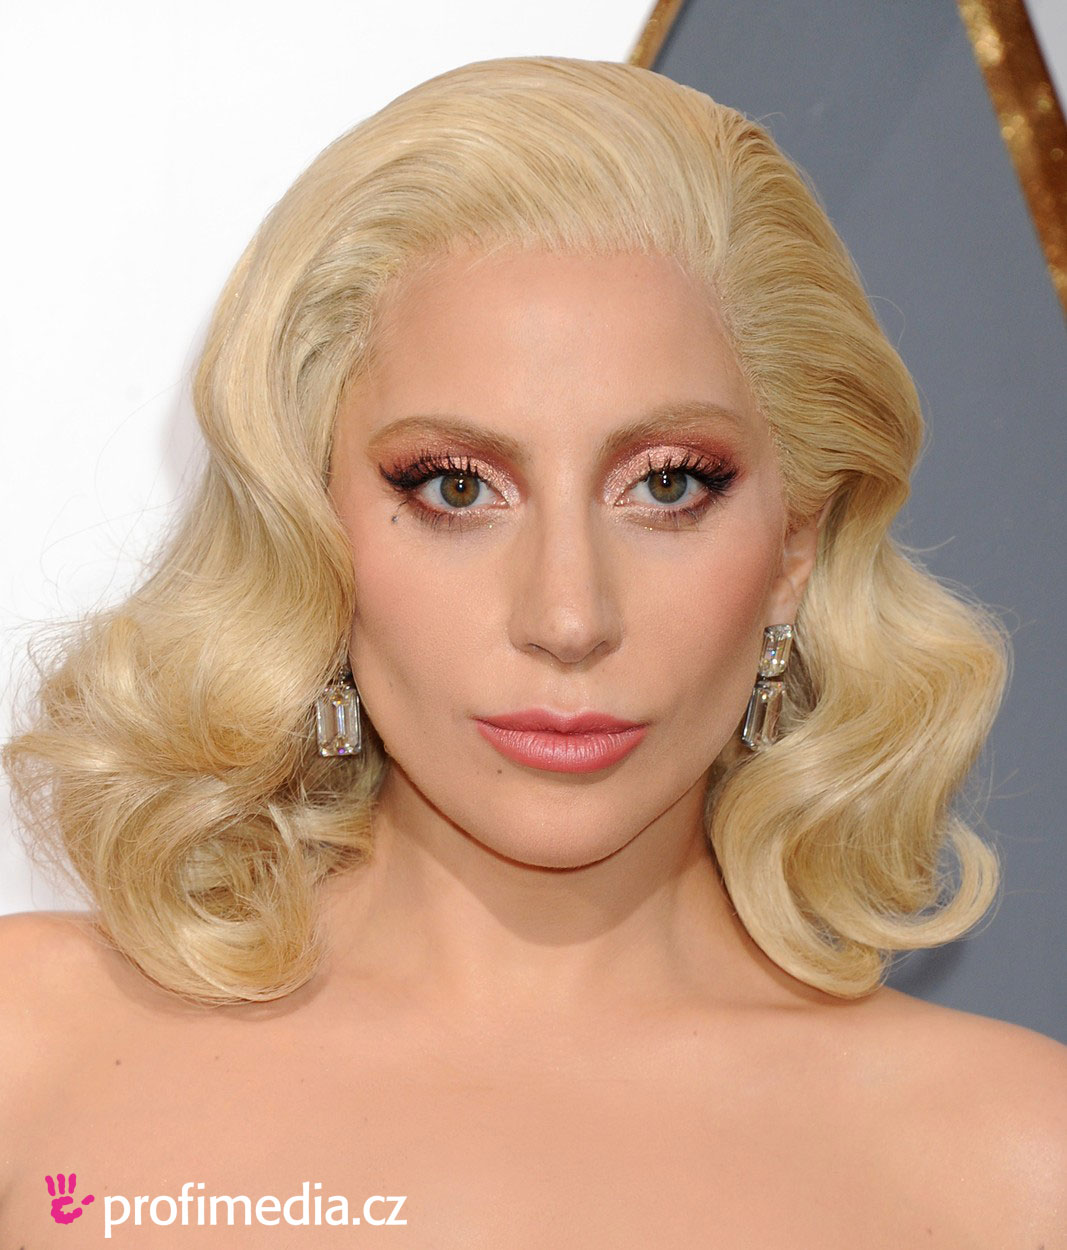 Lady Gaga Hairstyle Easyhairstyler